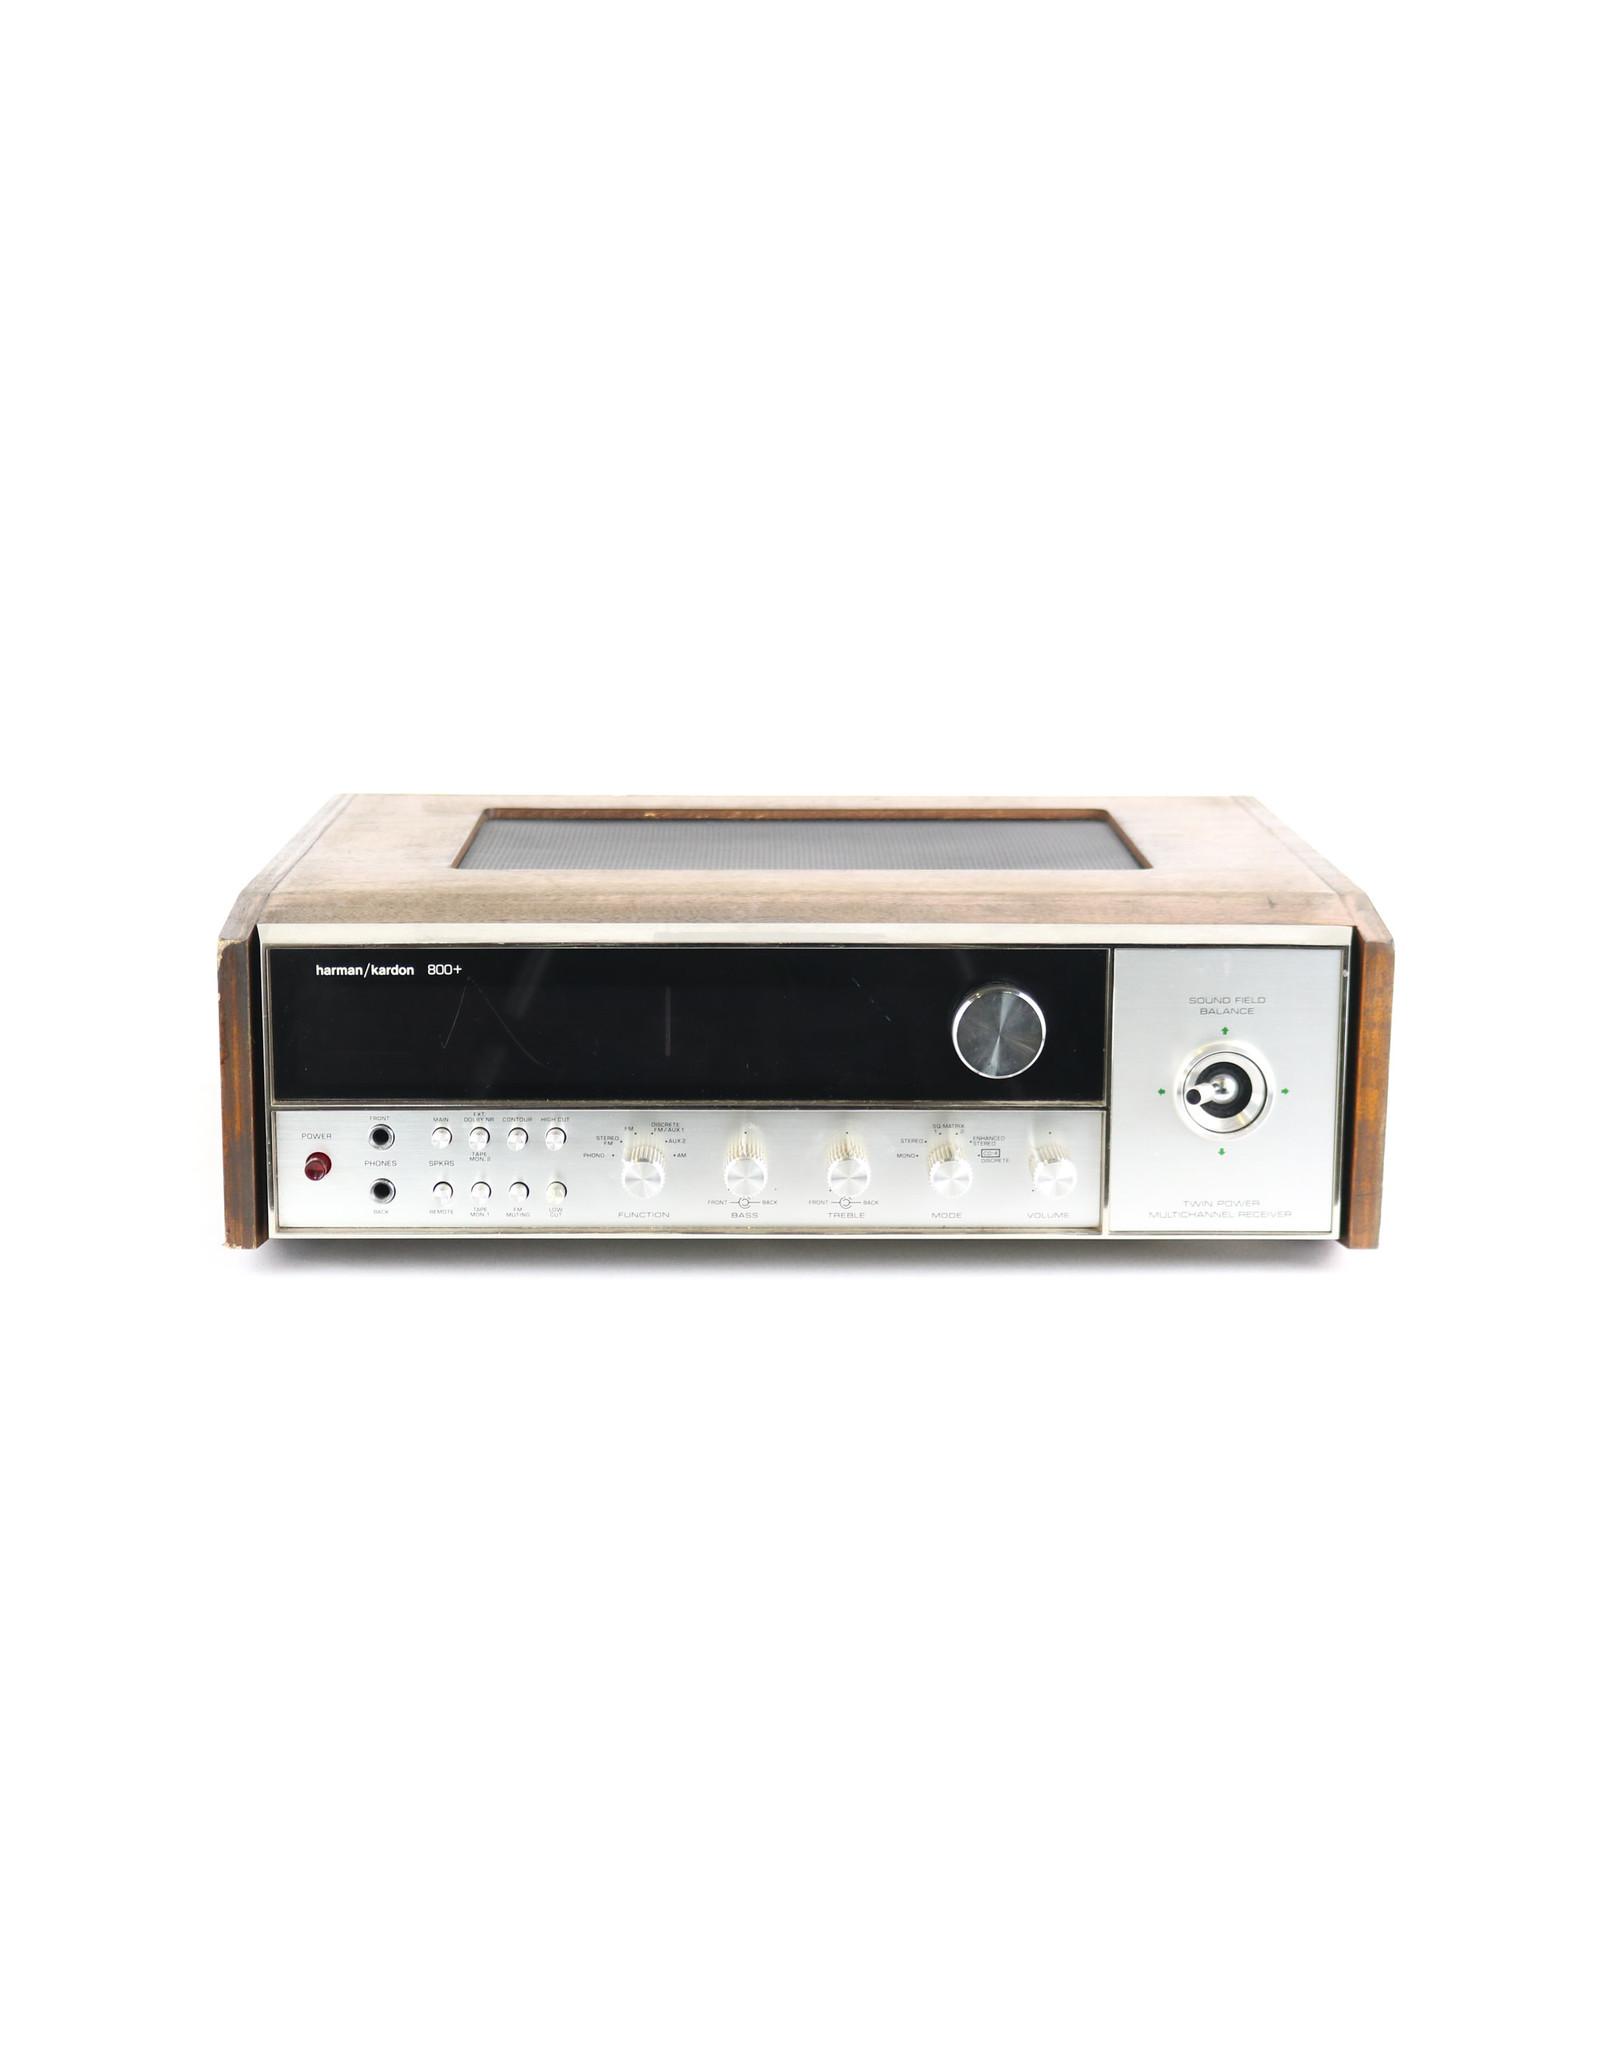 Harman/Kardon Harman/Kardon 800+ Quadraphonic Receiver USED